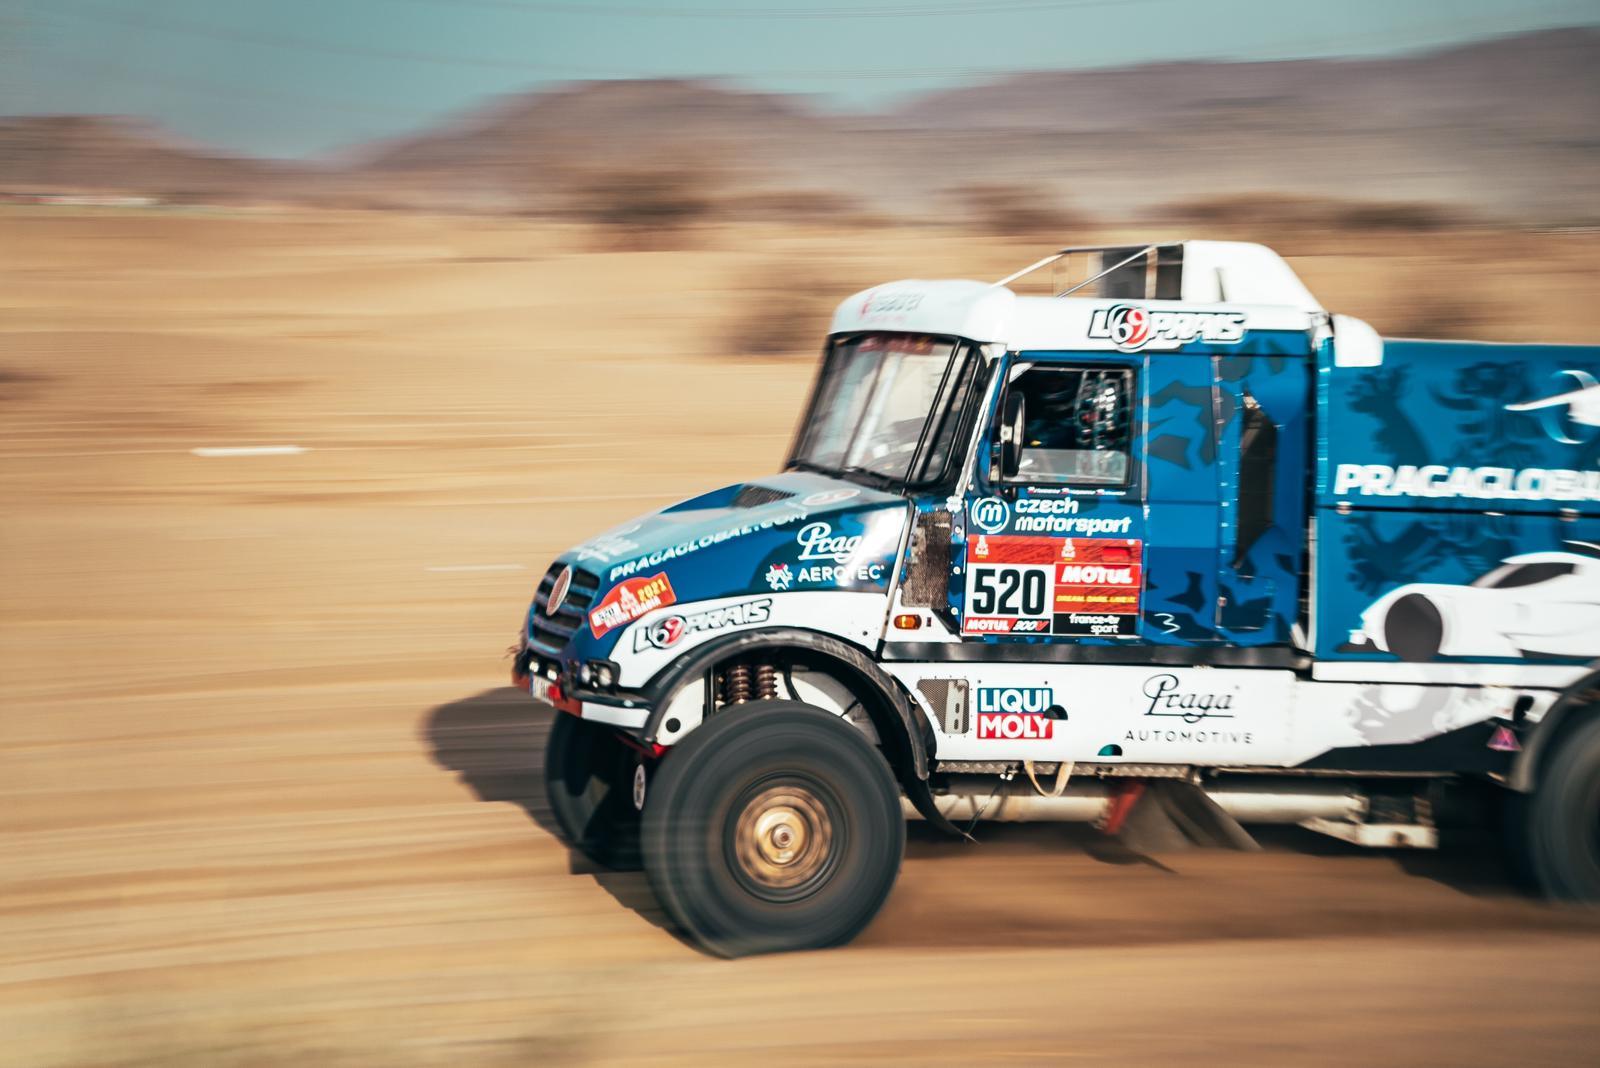 Dakar 2021: Successful shakedown for both trucks and three drivers of the Instaforex Loprais Praga Team